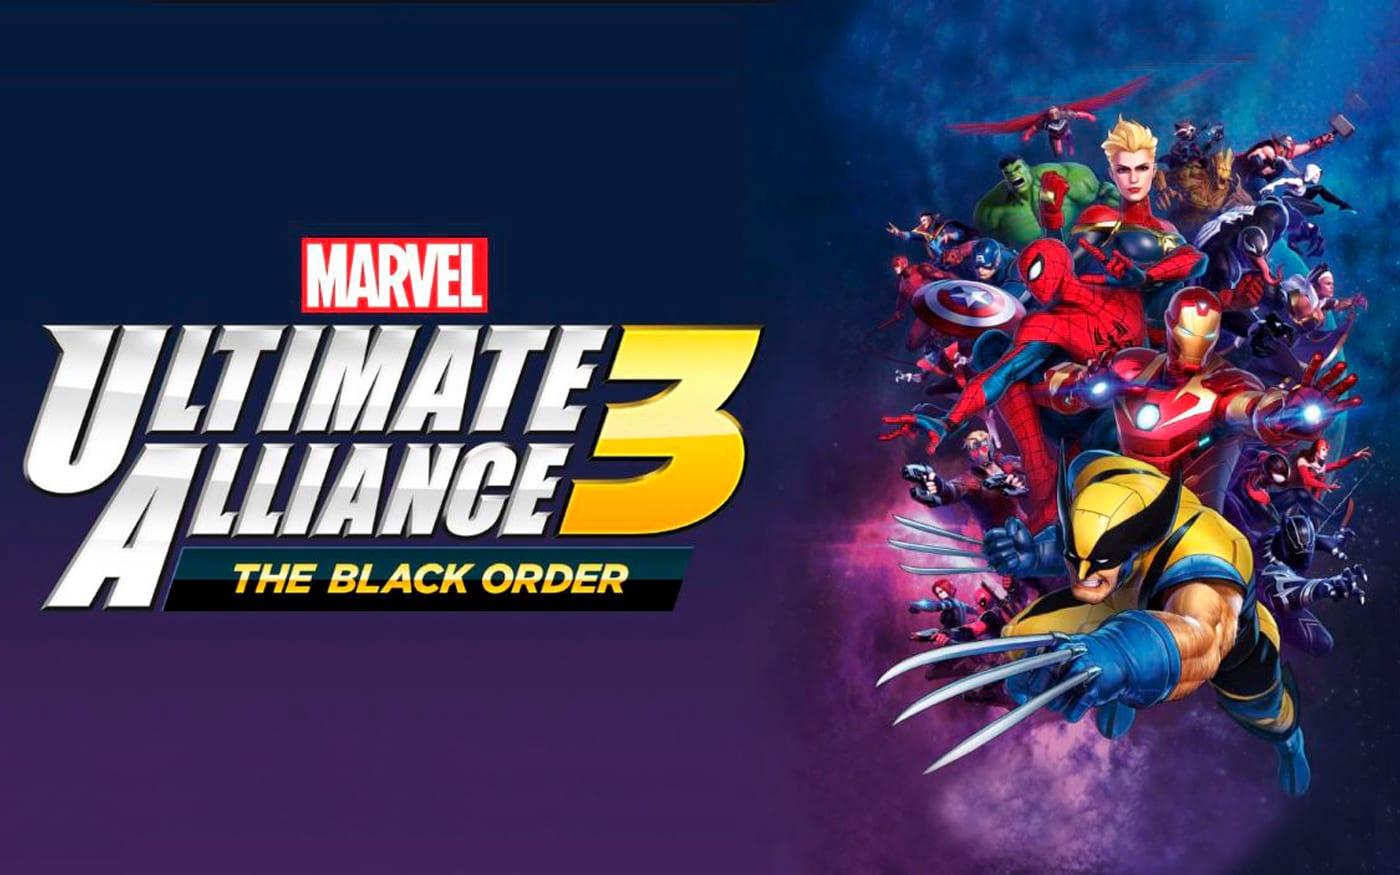 Marvel Ultimate Alliance 3: Gameplay mostra habilidades de Venon, Electro, Gavião Arqueiro e Wolverine